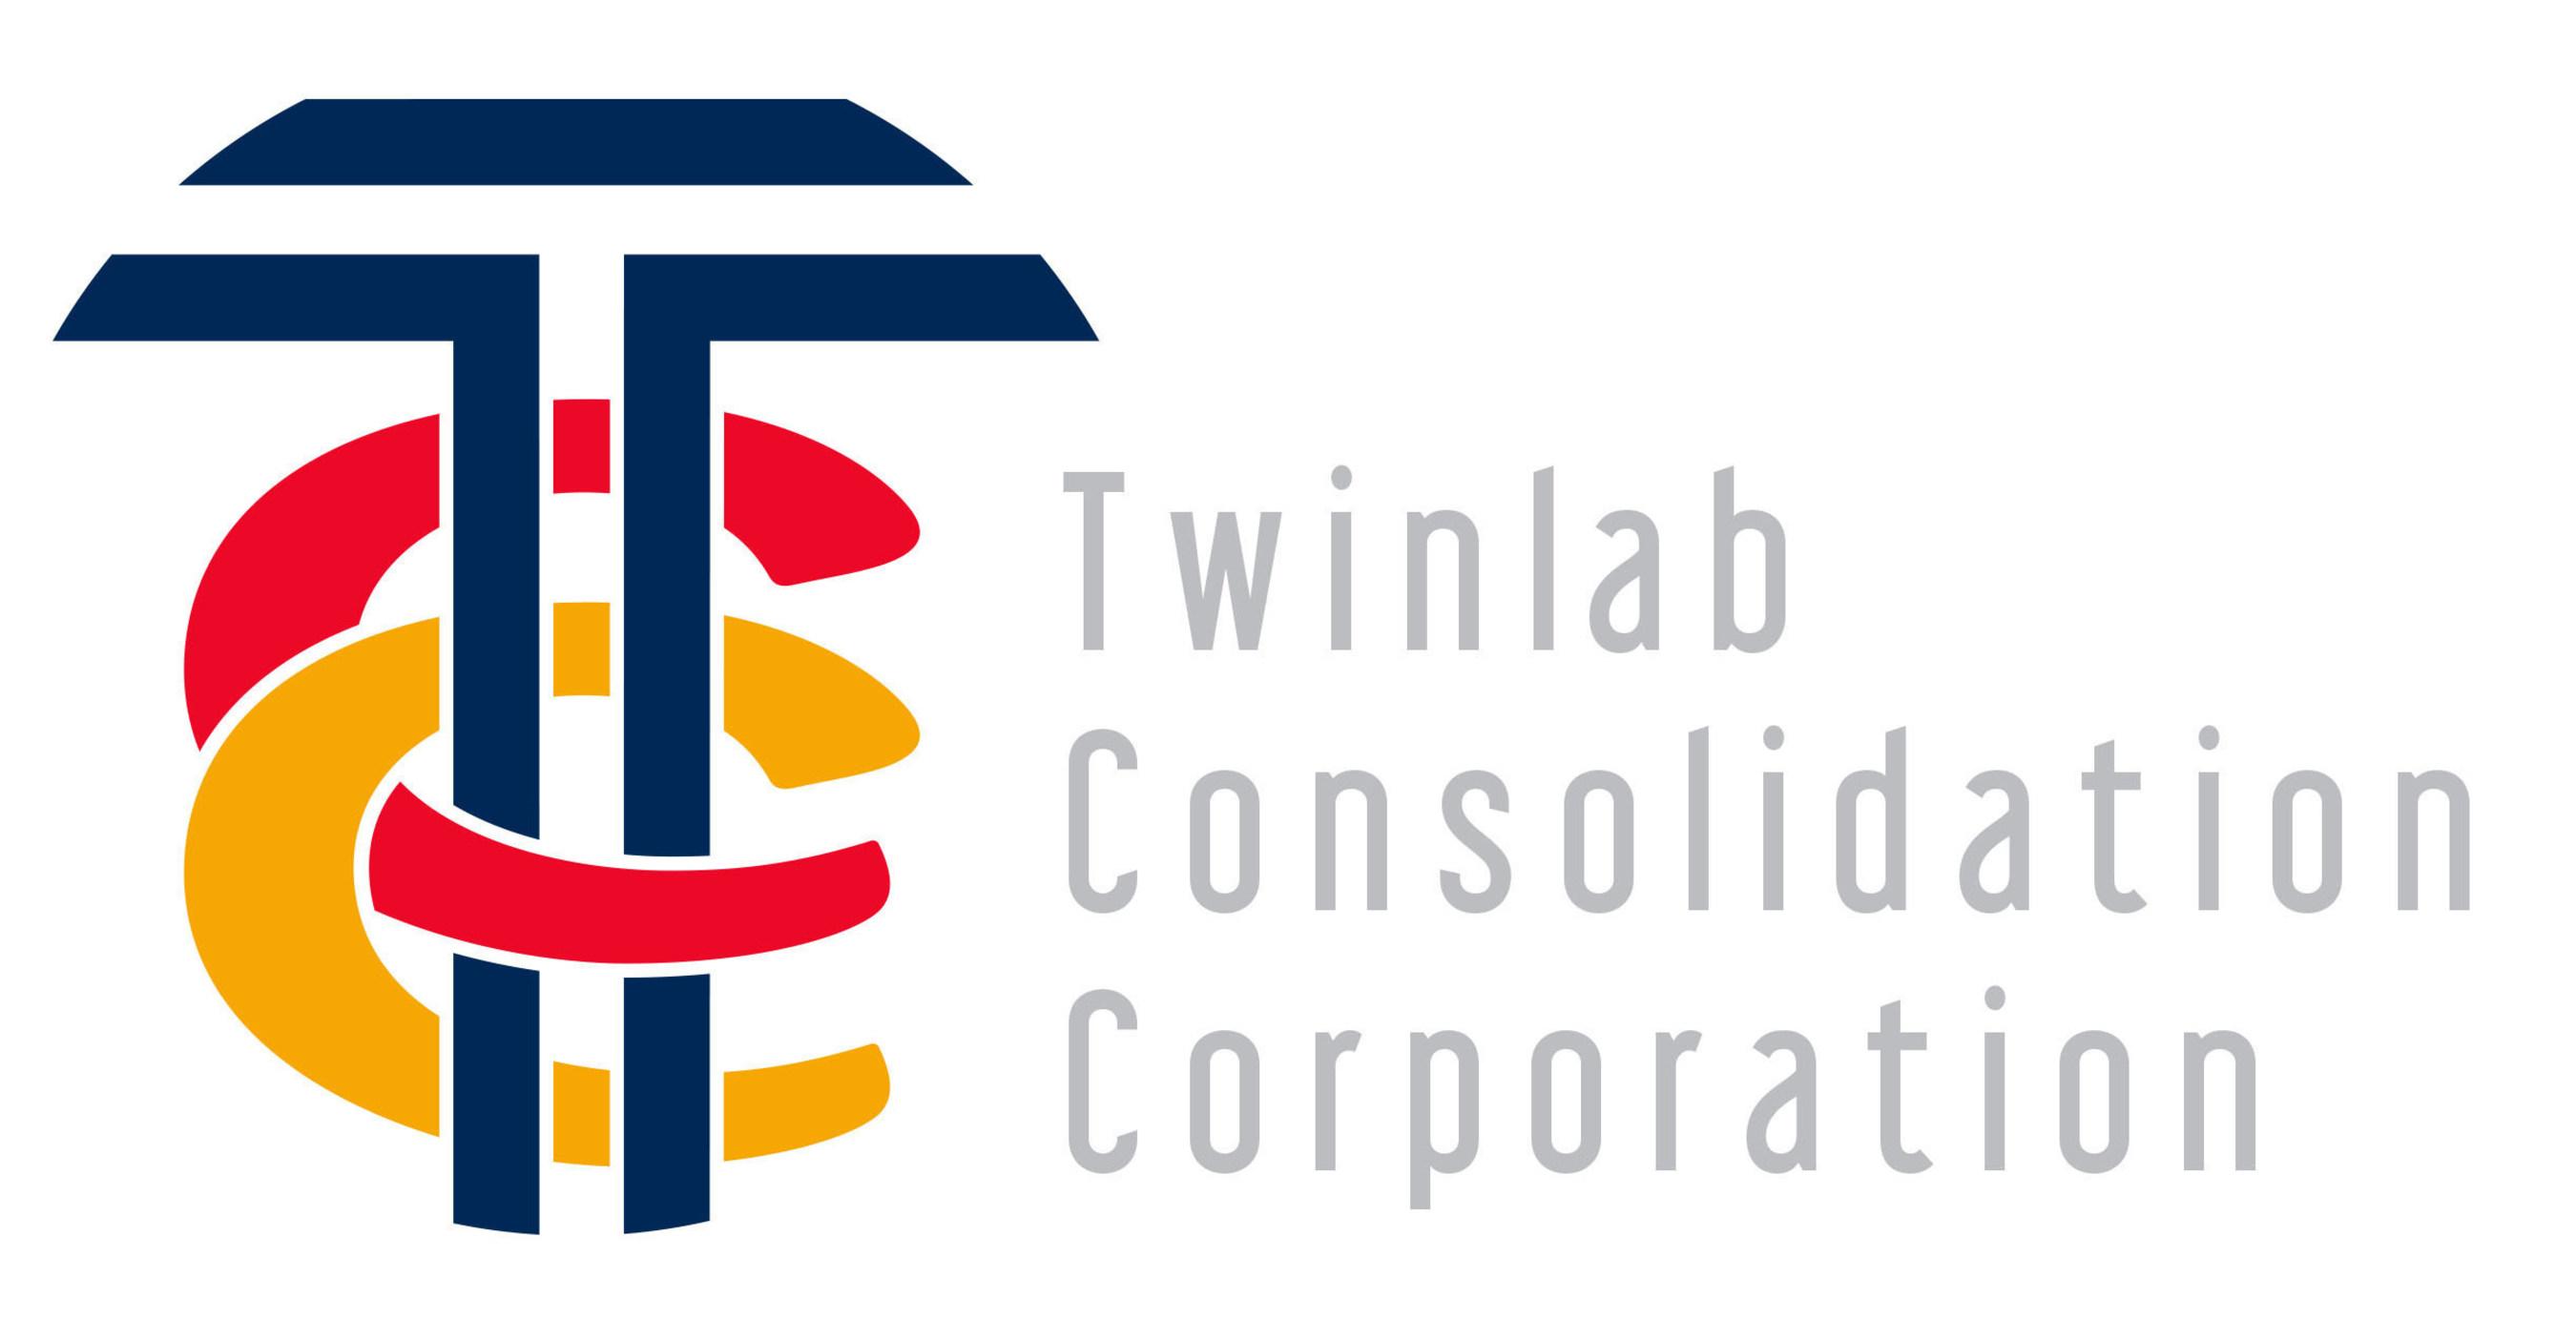 Twinlab Consolidation Corporation